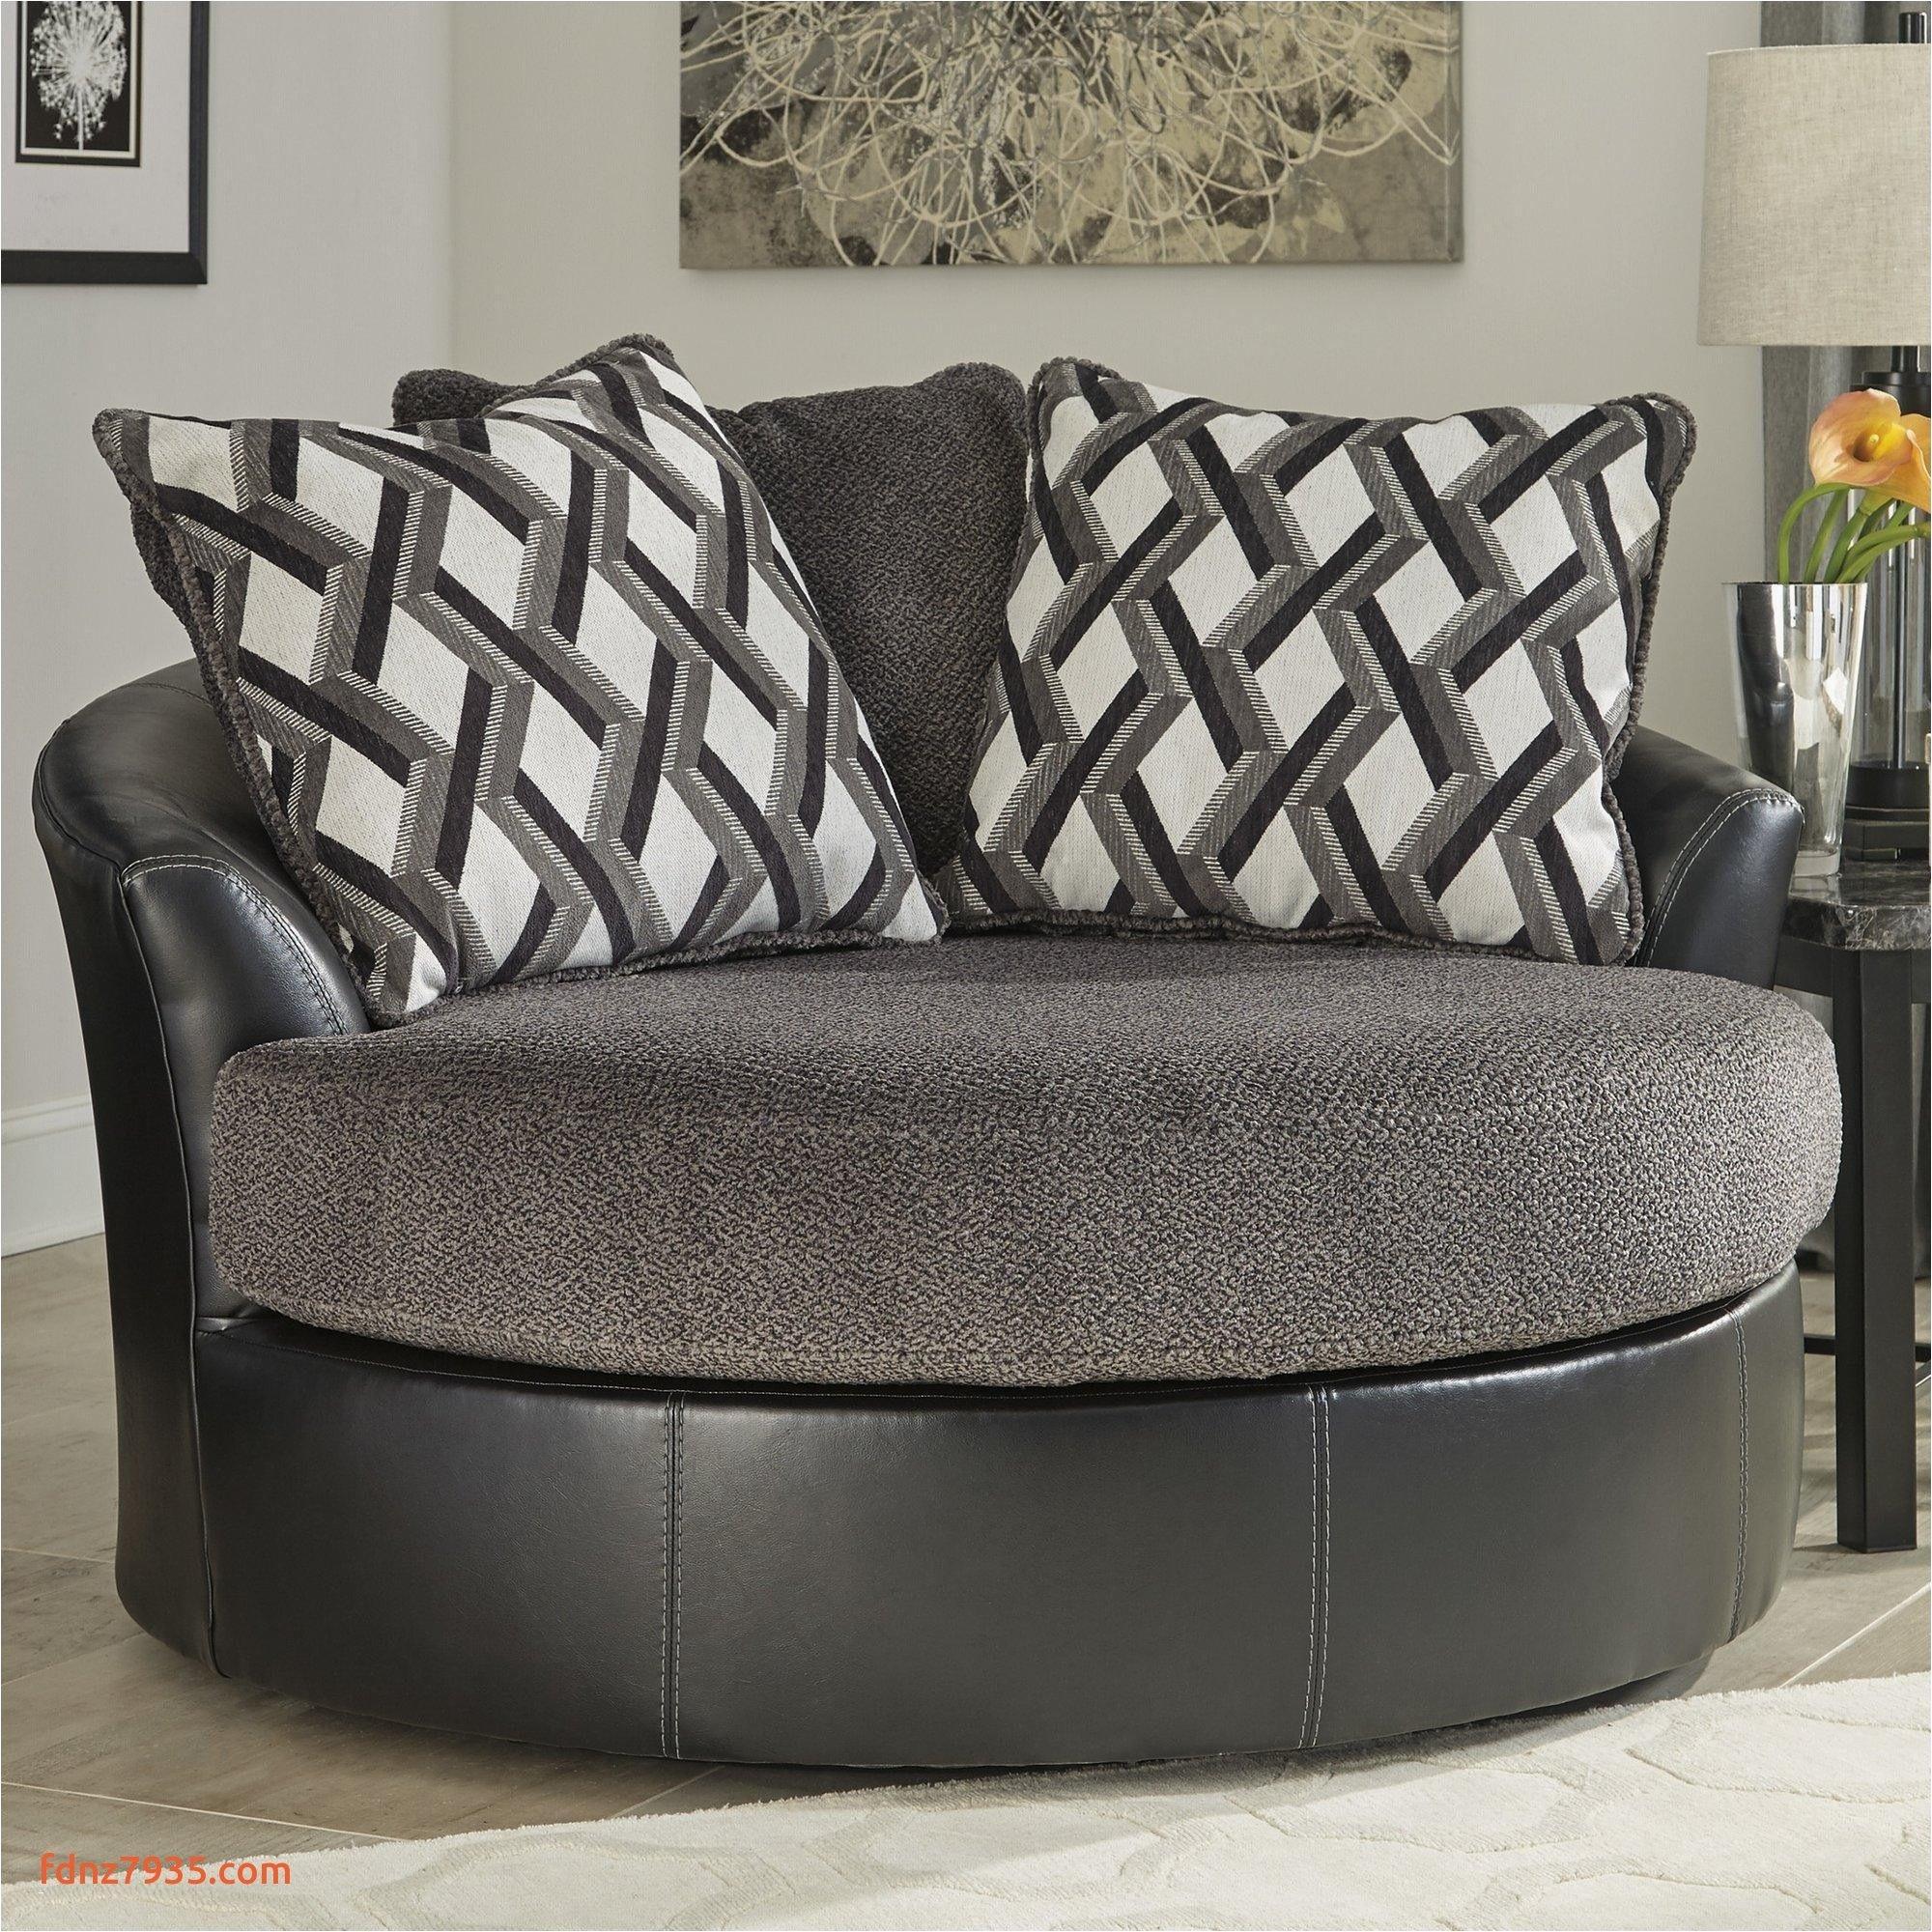 discount furniture springfield mo unique sams club sleeper sofa fresh sofa design stock of discount